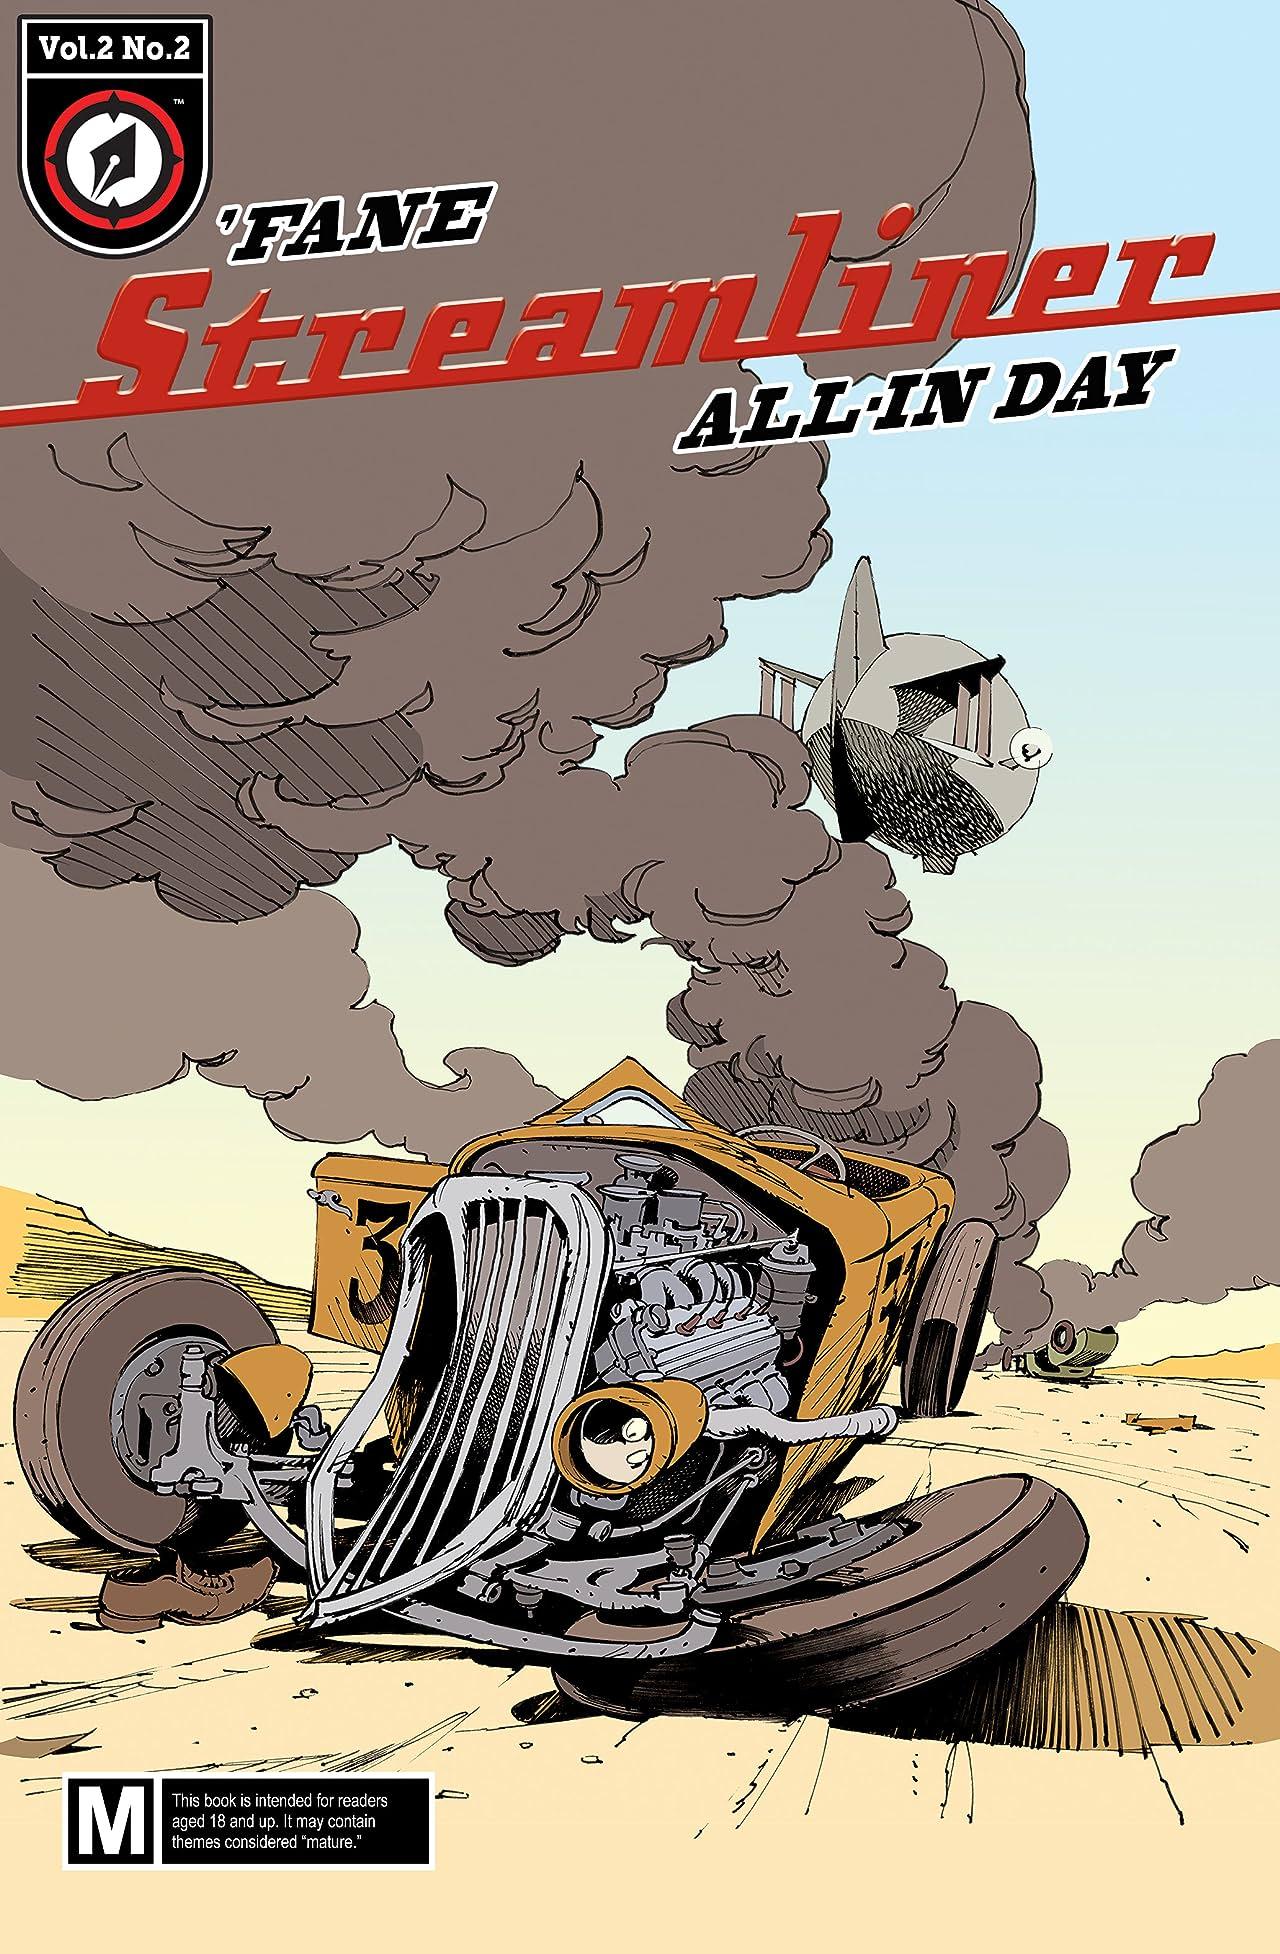 Streamliner #7: All-in Day